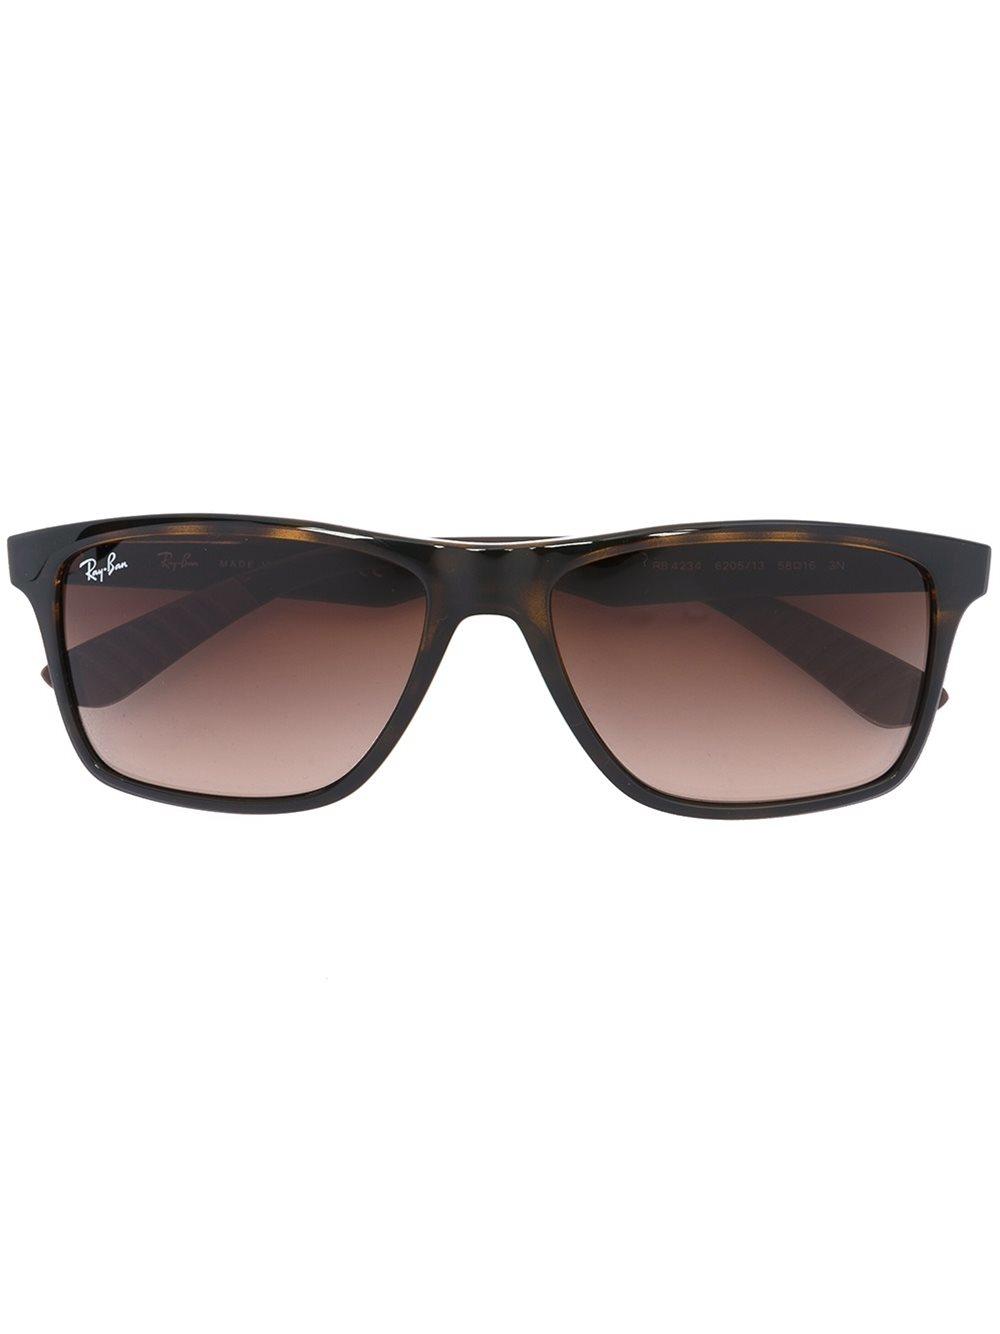 Ray Ban Square Frame Glasses : Ray-ban - Square Frame Sunglasses - Men - Acetate/rubber ...